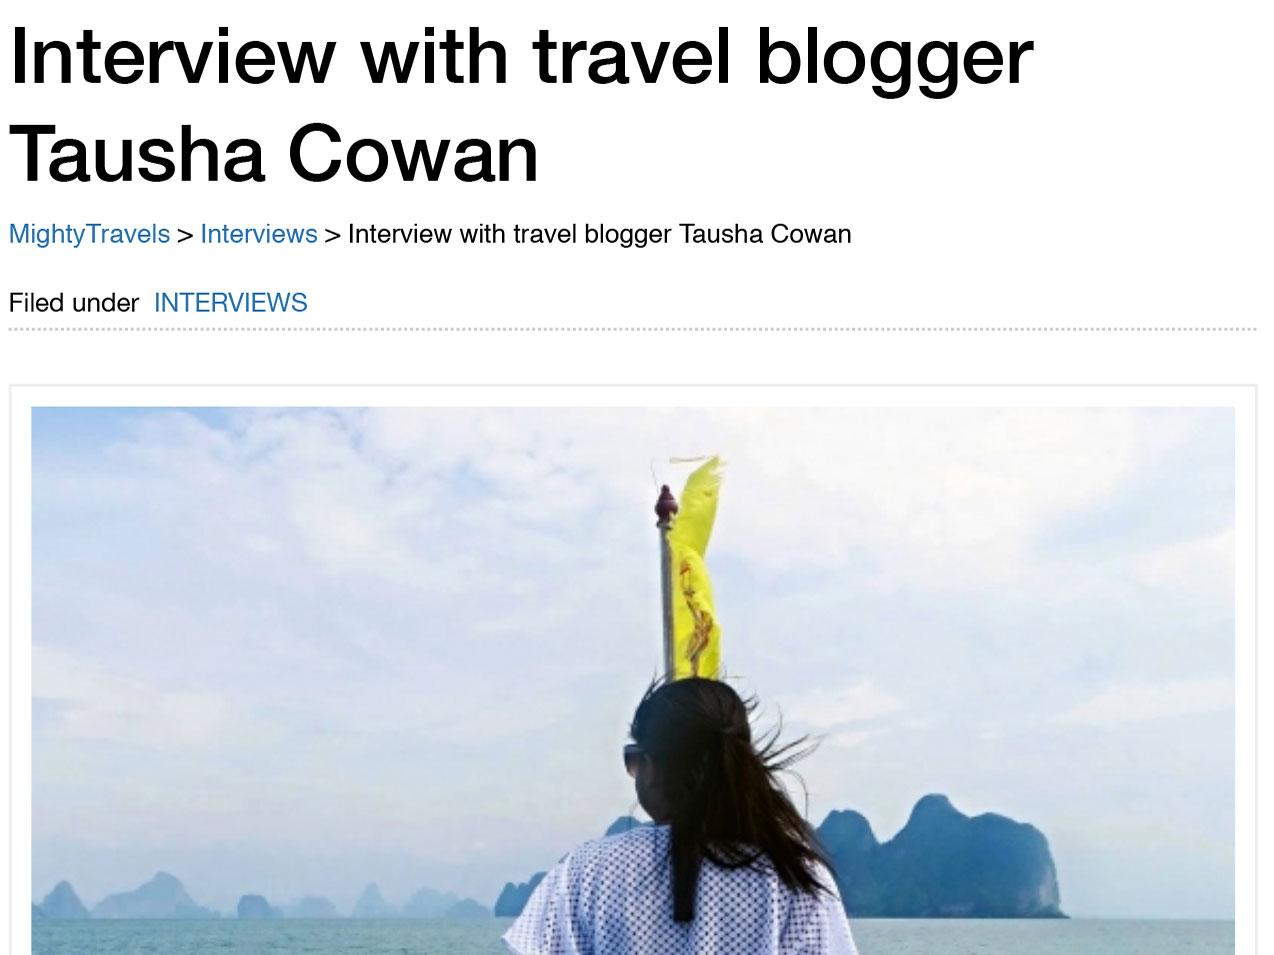 Tausha-Cowan-Interview-Mighty-Travels